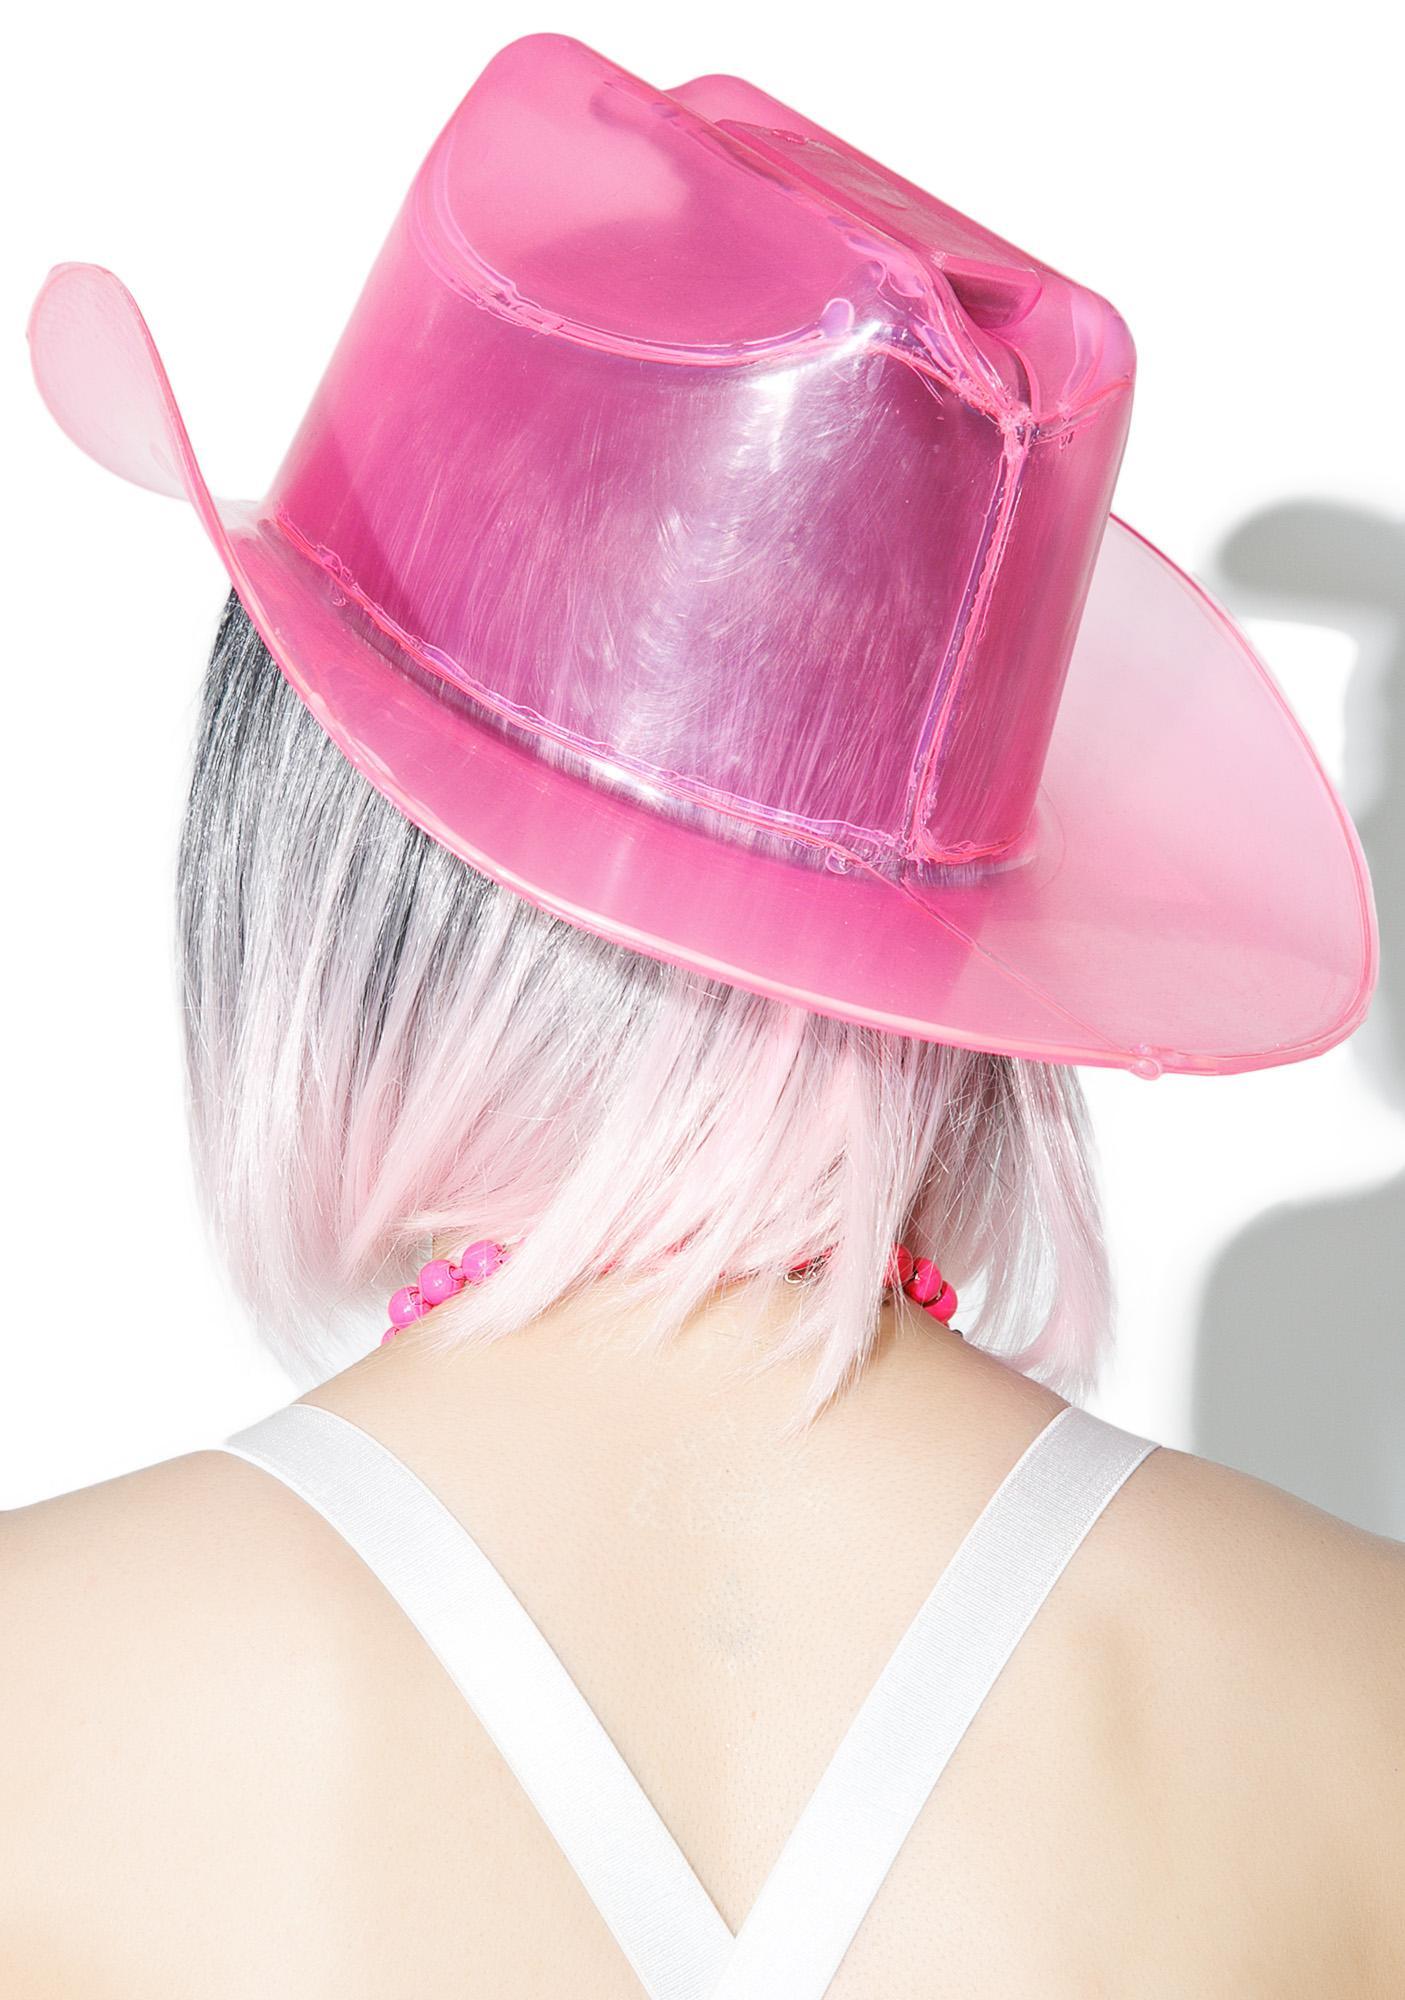 Pink Cowboy Hats Bulk - Hat HD Image Ukjugs.Org 08ef4b9be01